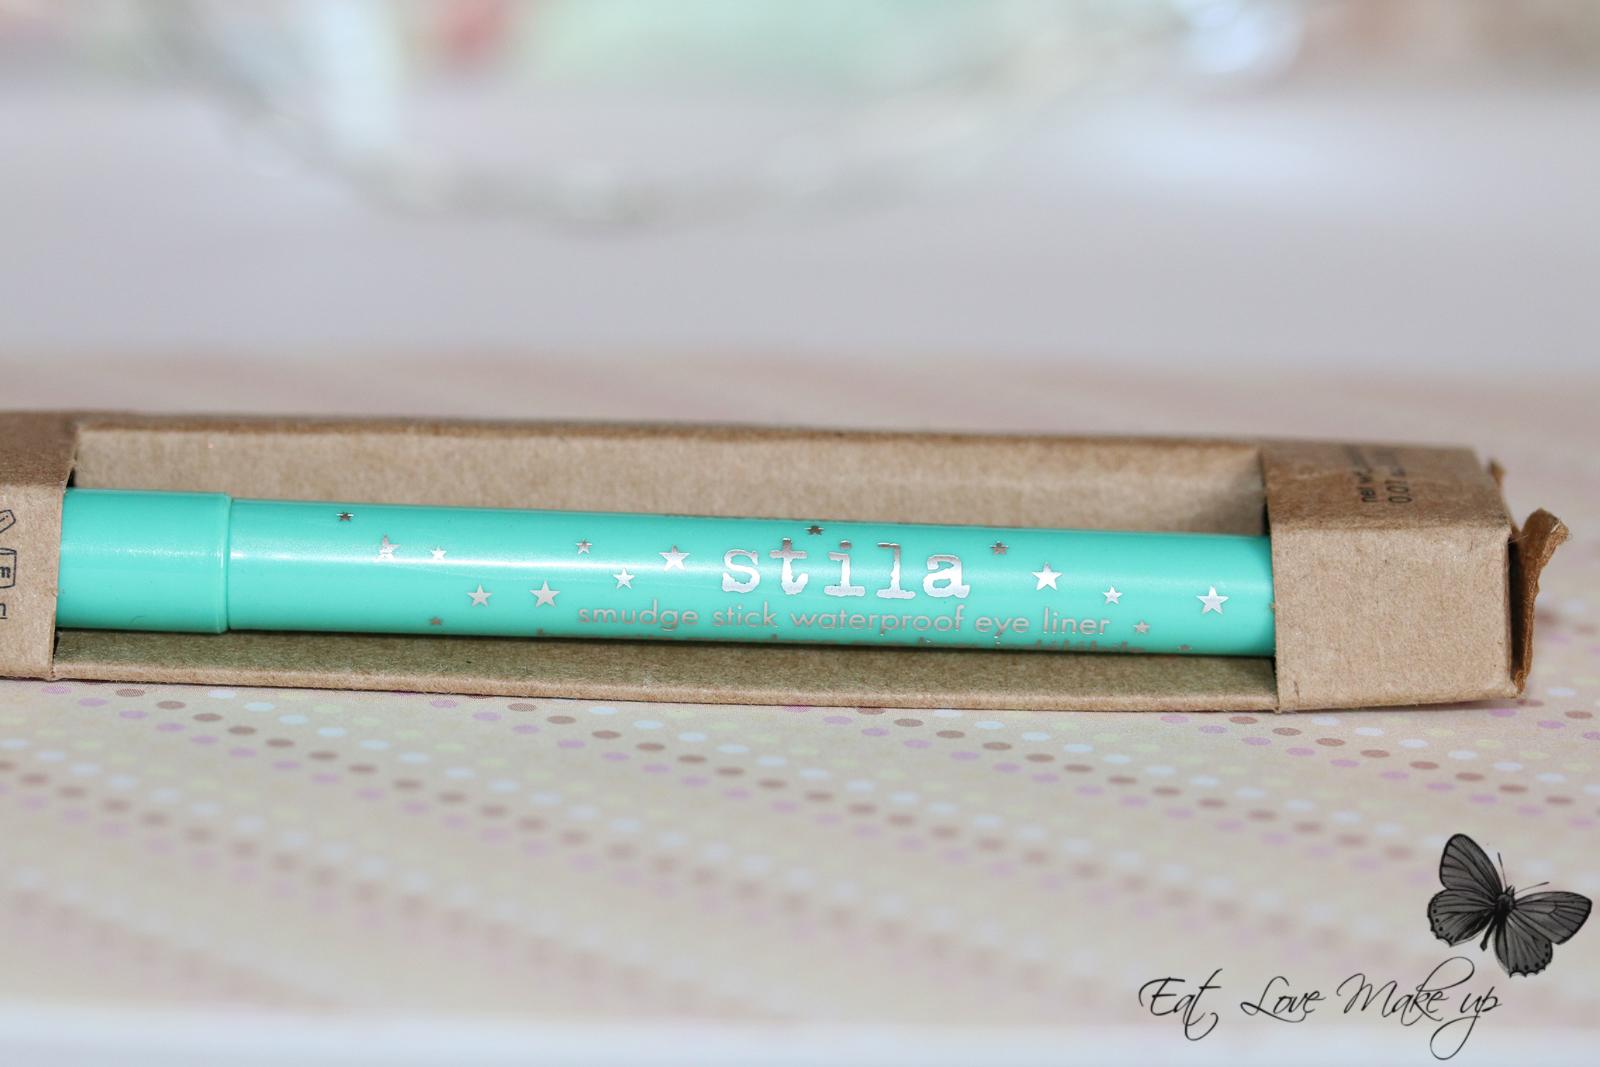 Stila Smudge Stick Waterproof Turquoise Eye Liner